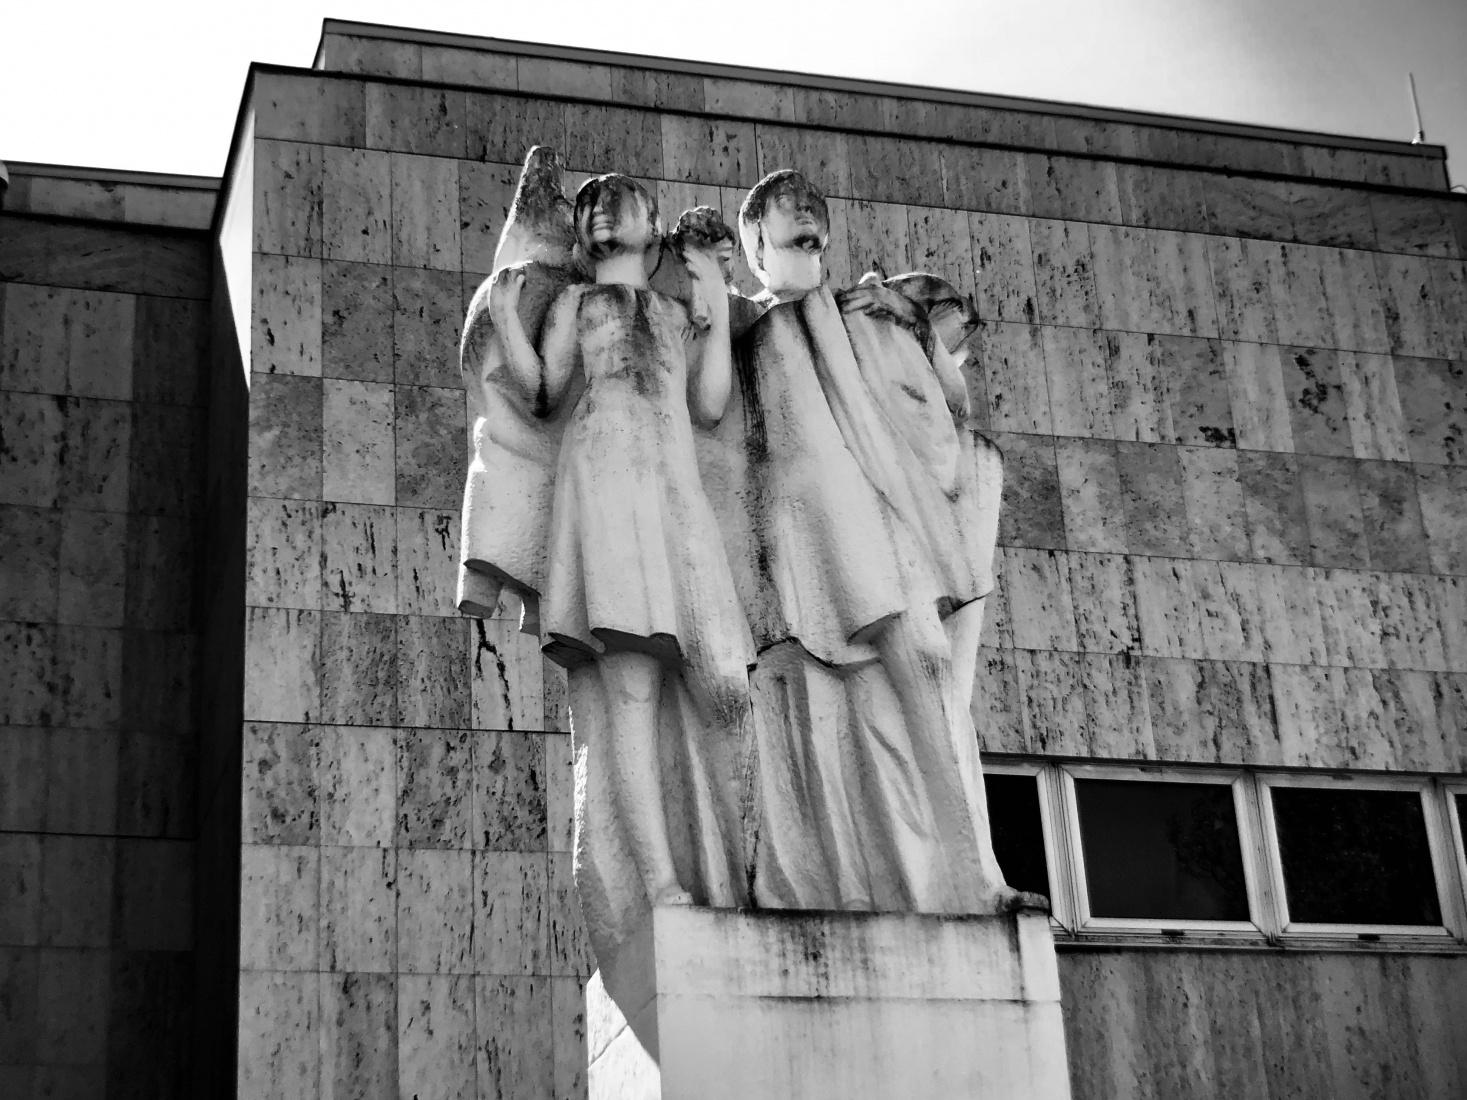 Communist era statue in front of Russian school in Prague, Bubeneč, with typical communist era architecture behind, near Siberia Square,  Sibiřské náměstí.